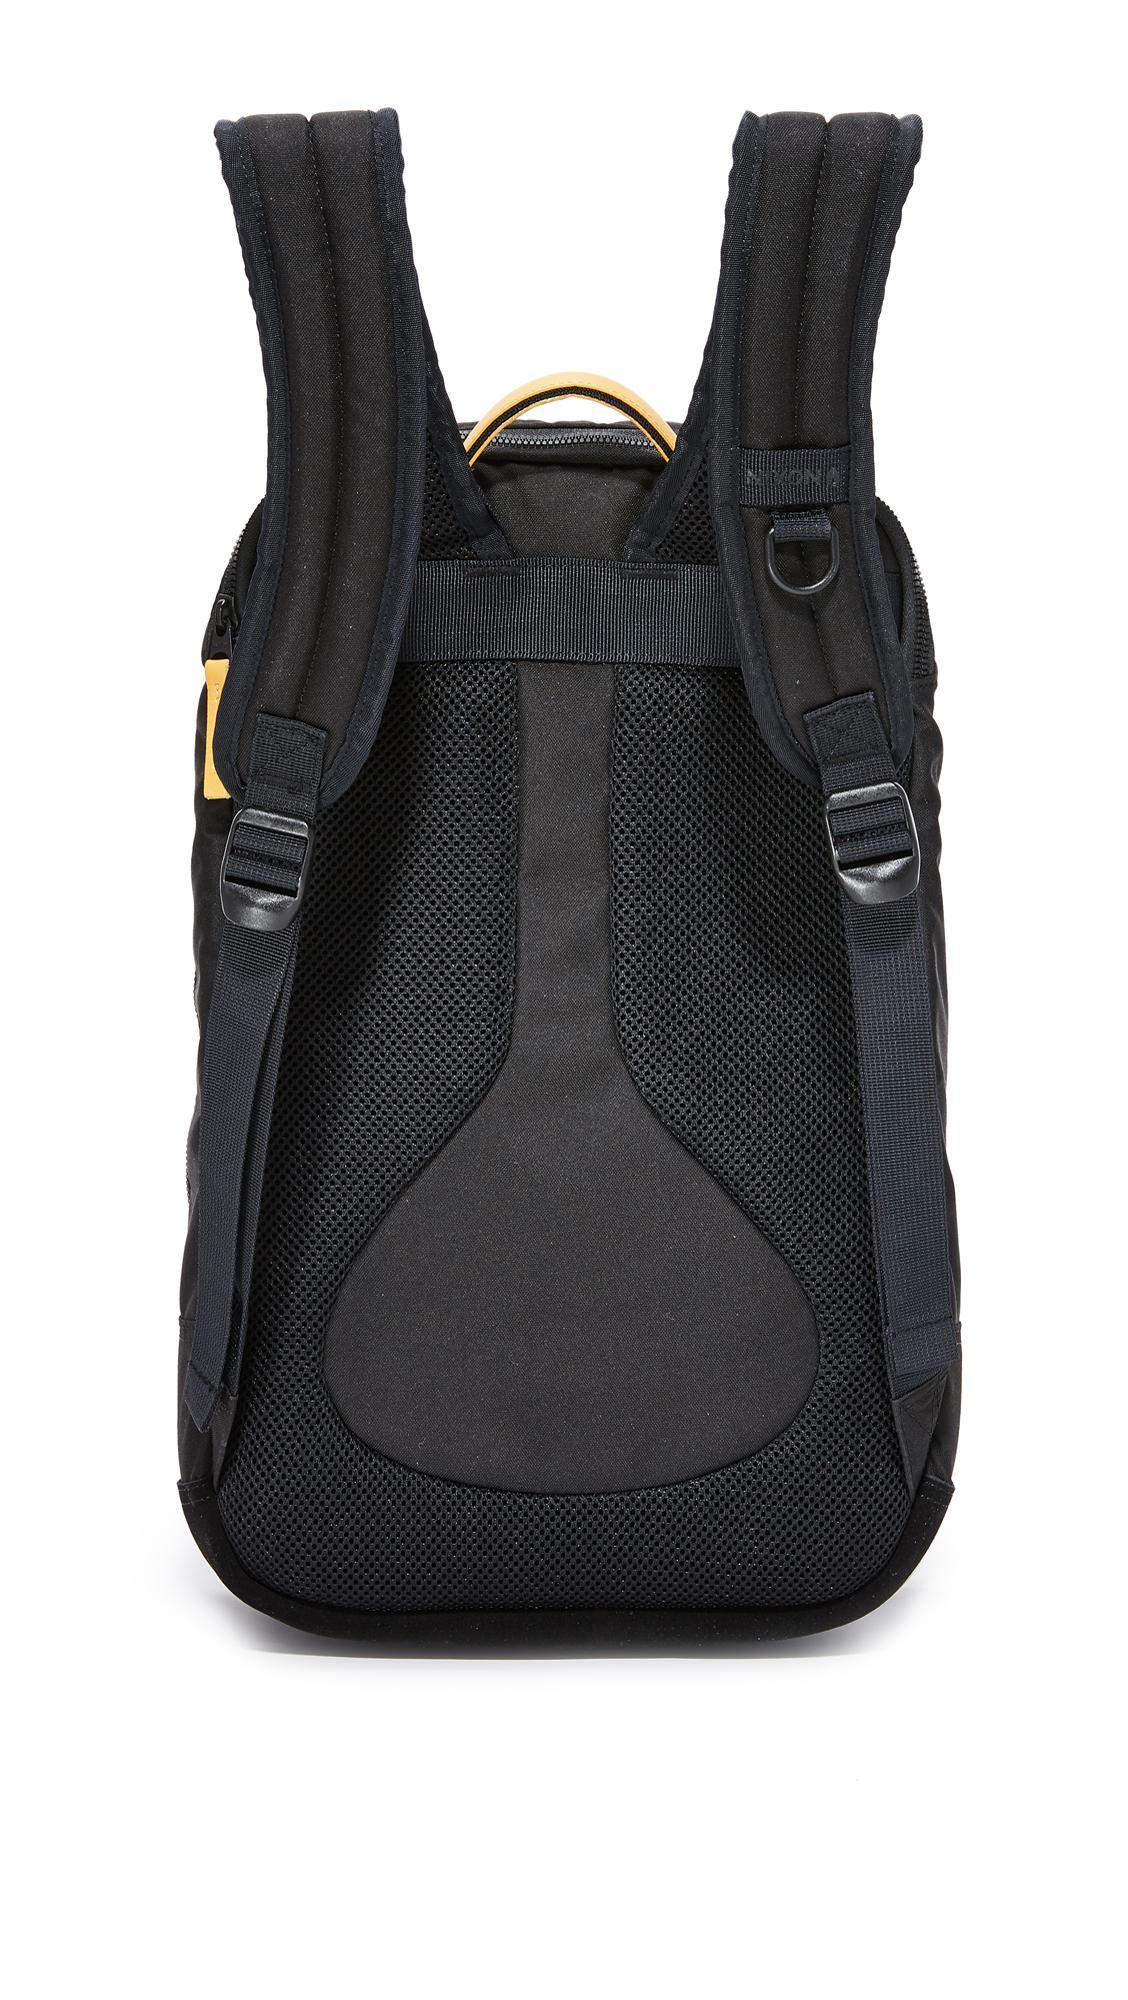 ec92d70cd01 Nixon Range Backpack in Black for Men - Lyst